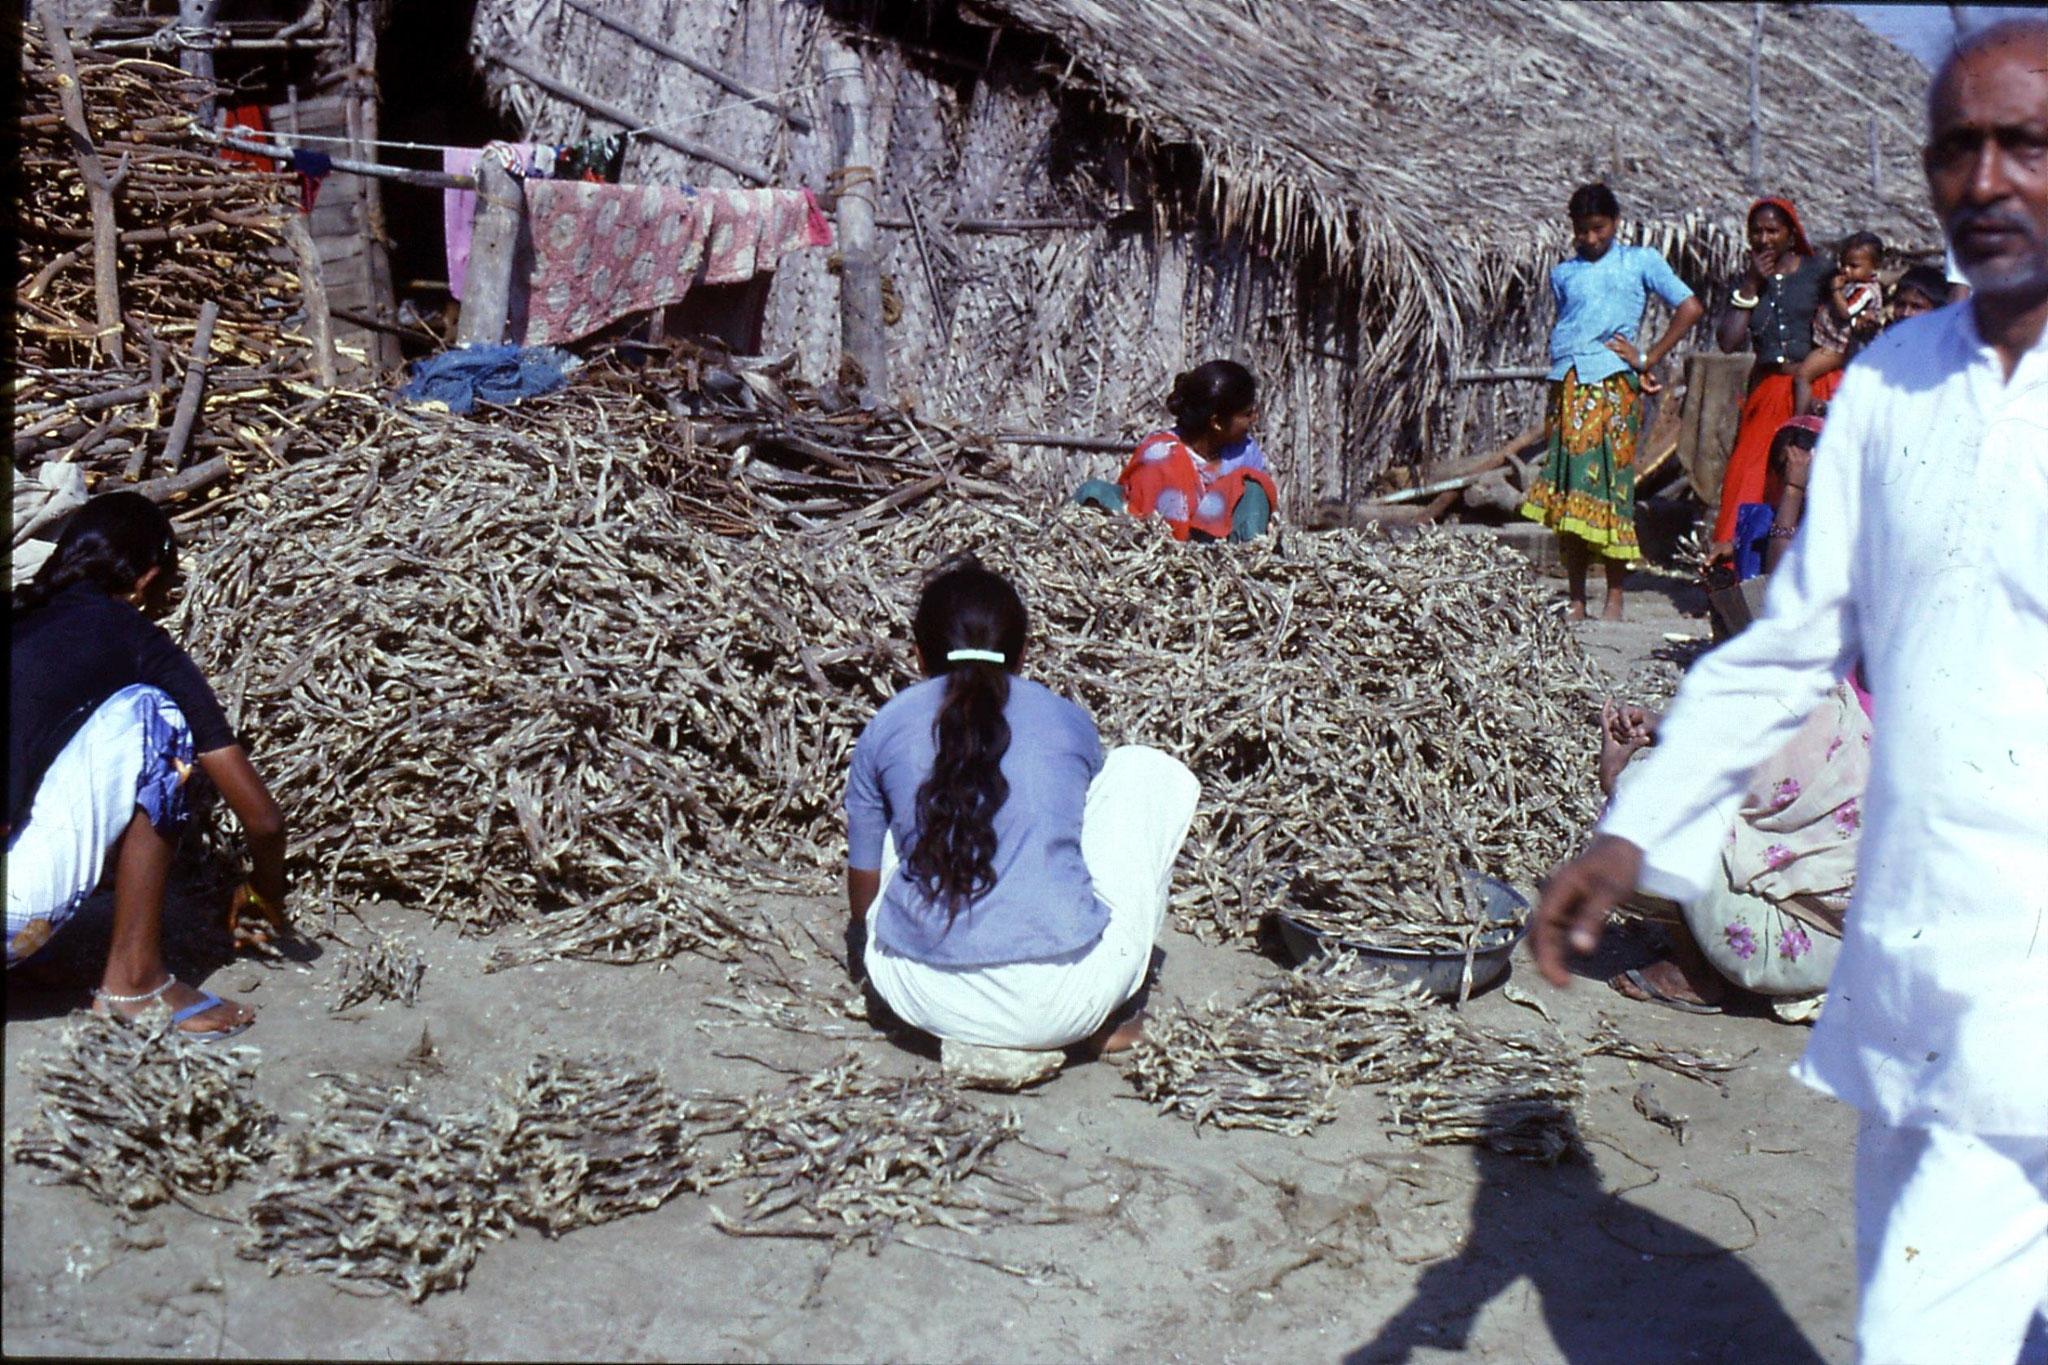 16/12/1989: 7: Diu Goghla fisherwomen